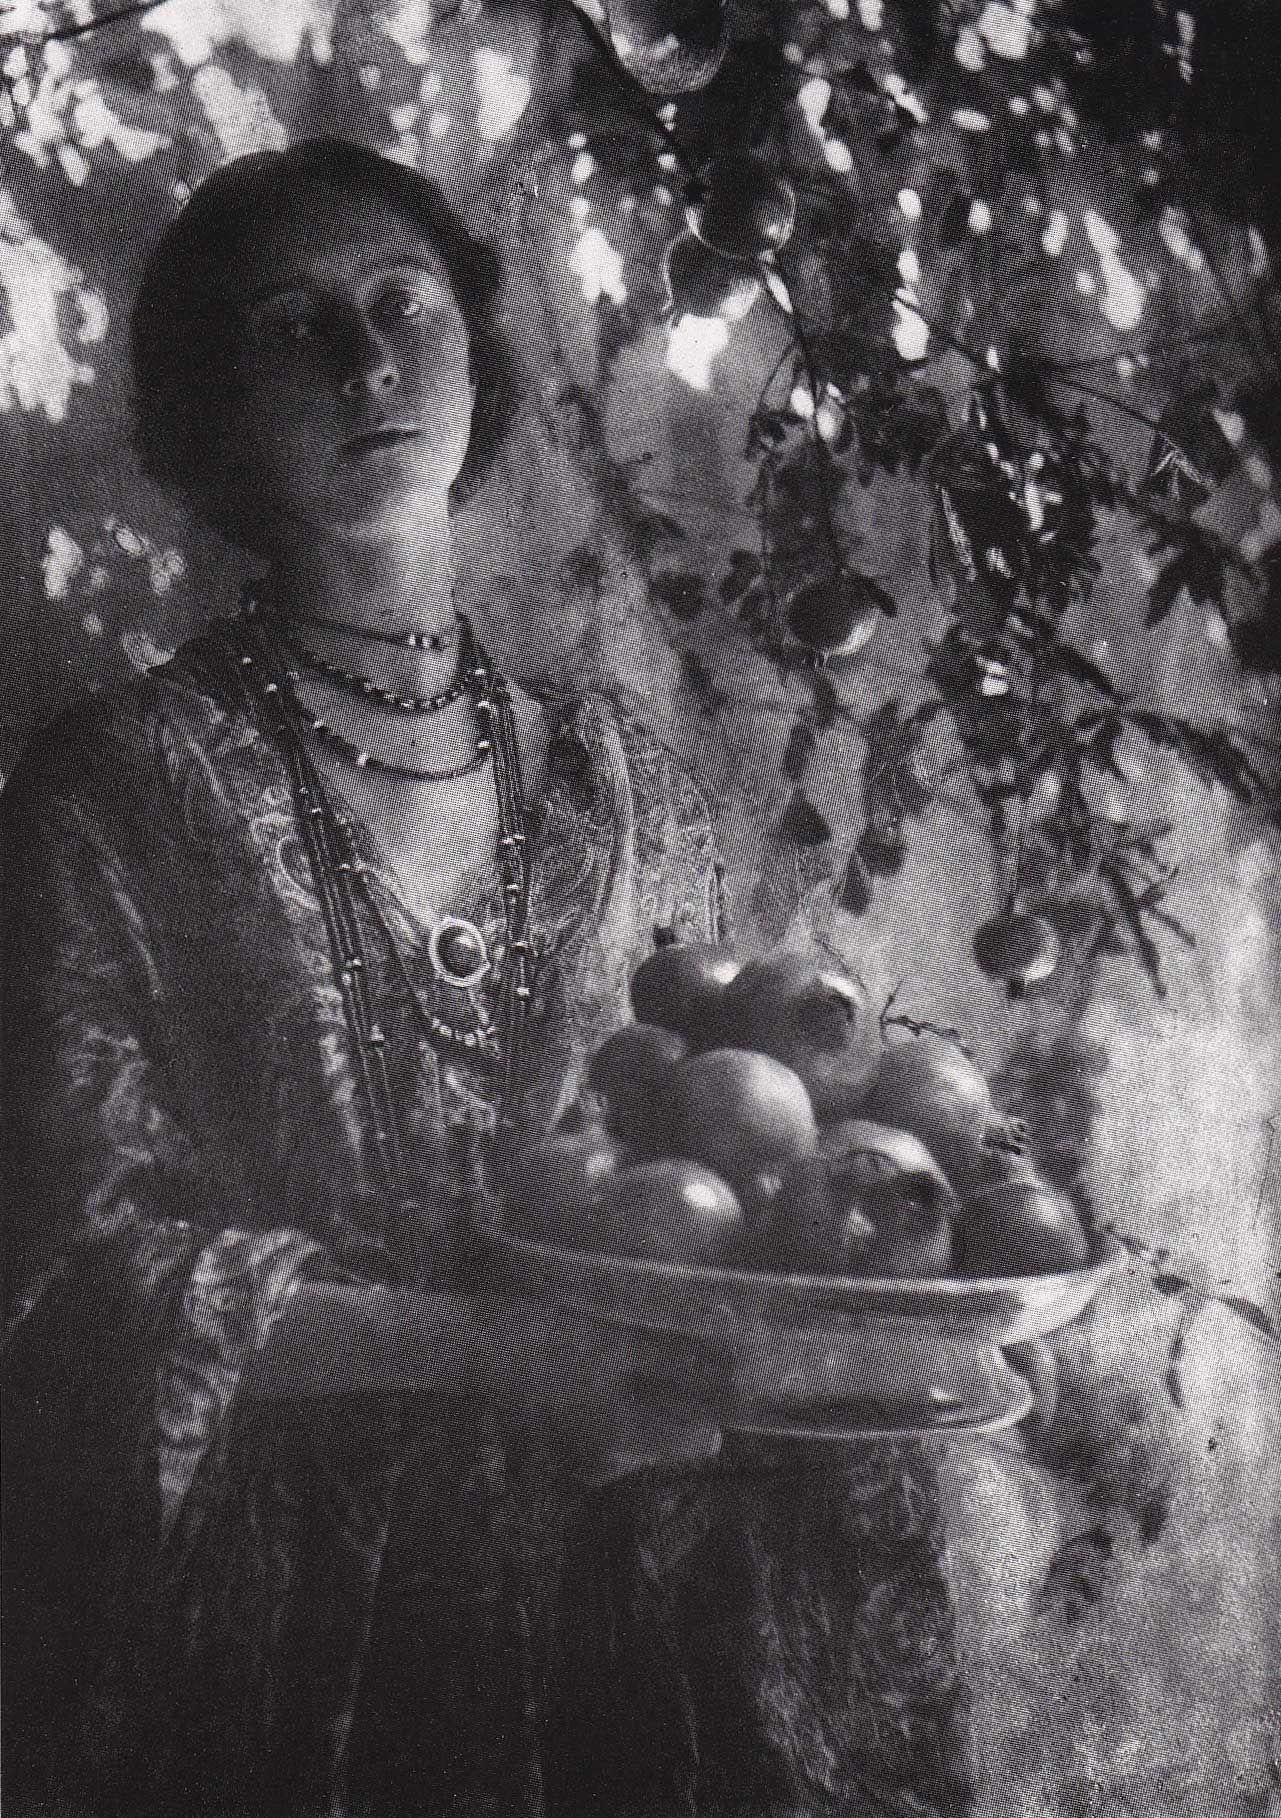 Minna keene decorative study number 1 pomegranates c 1906